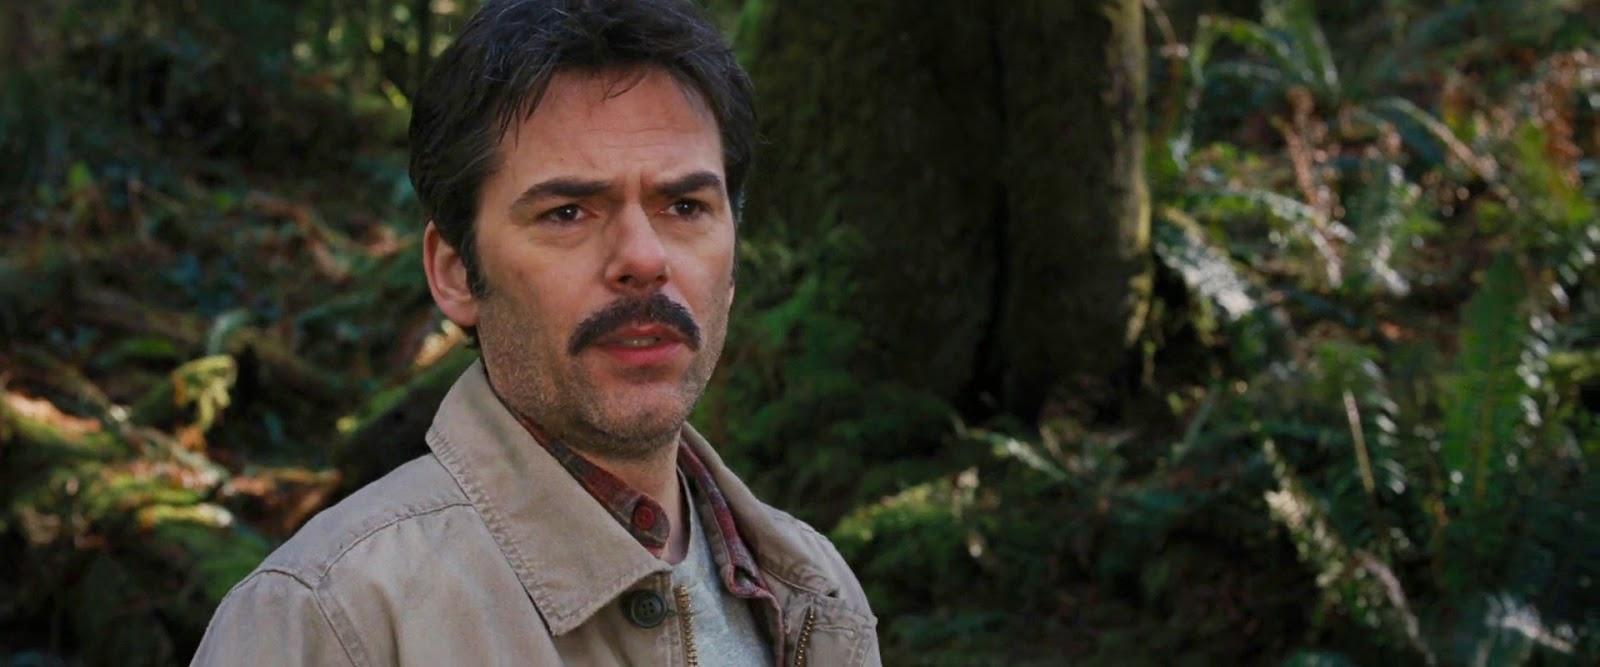 The Twilight Saga - Breaking Dawn Part 2 (2012) S4 s The Twilight Saga - Breaking Dawn Part 2 (2012)